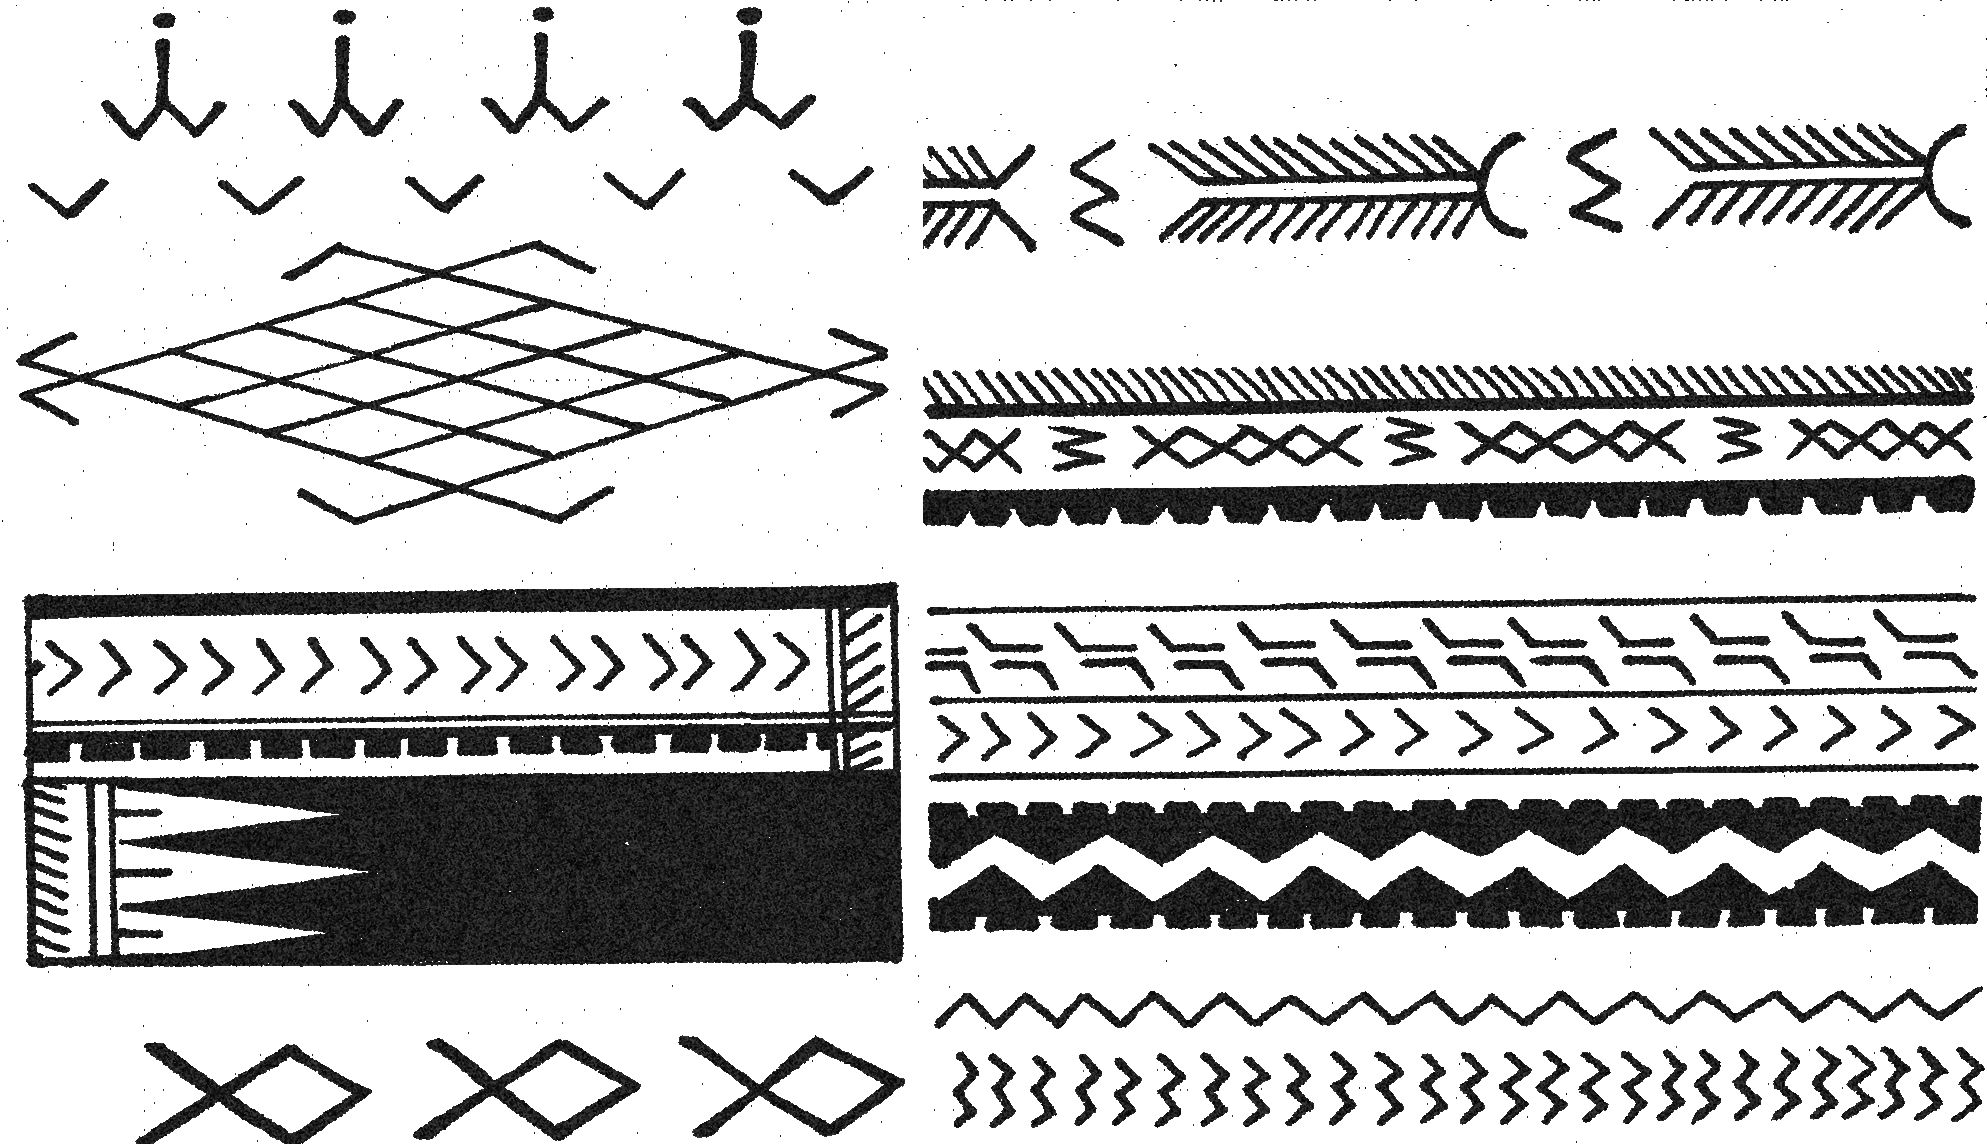 Samoan Tatau Symbols And Meaning Premier Precedent 1 2 Tattoo